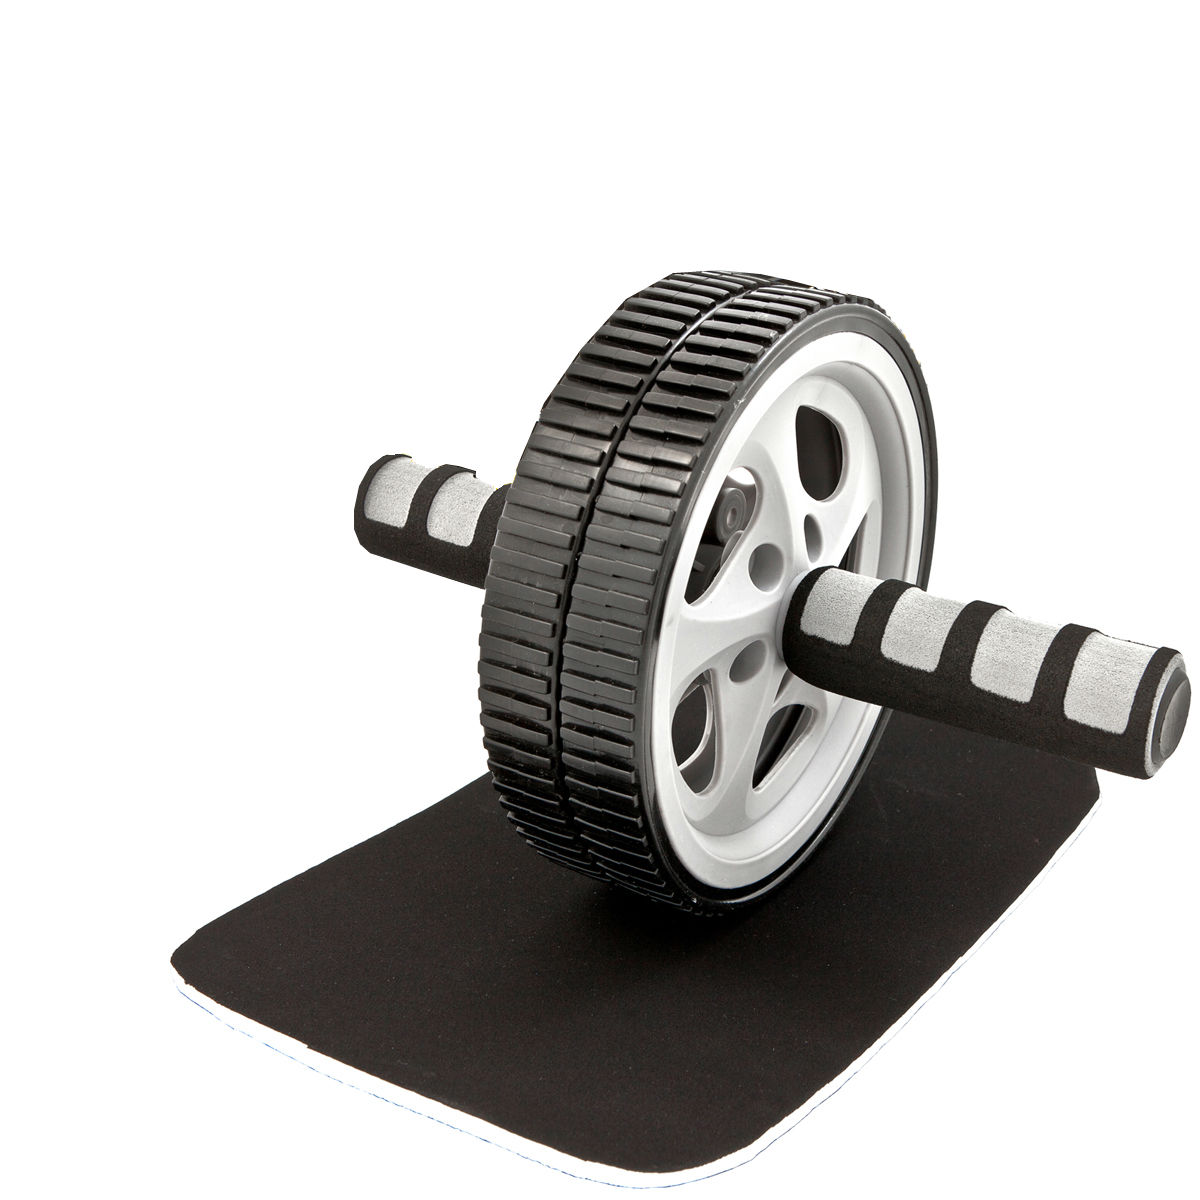 Tunturi-Bremshey Luxury Exercise Wheel With Kneepad Set